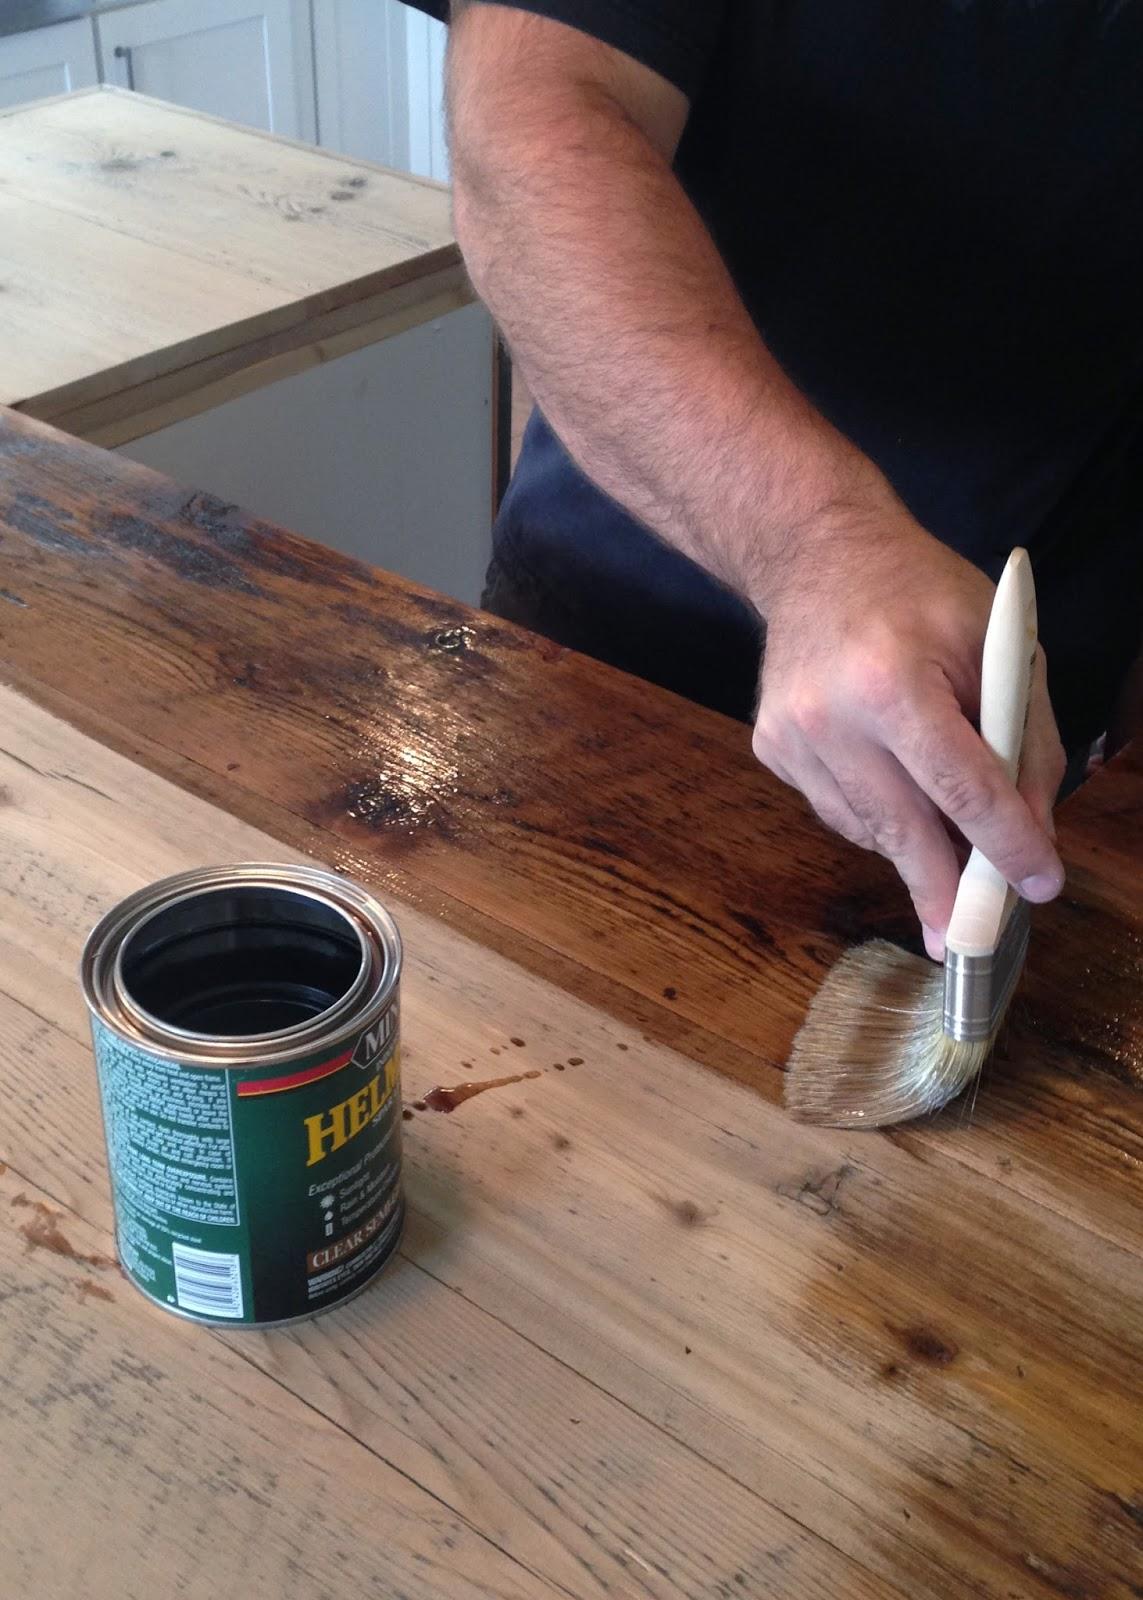 diy reclaimed wood countertop wooden kitchen countertops DIY Reclaimed Wood Countertop coating with Spar Urethane